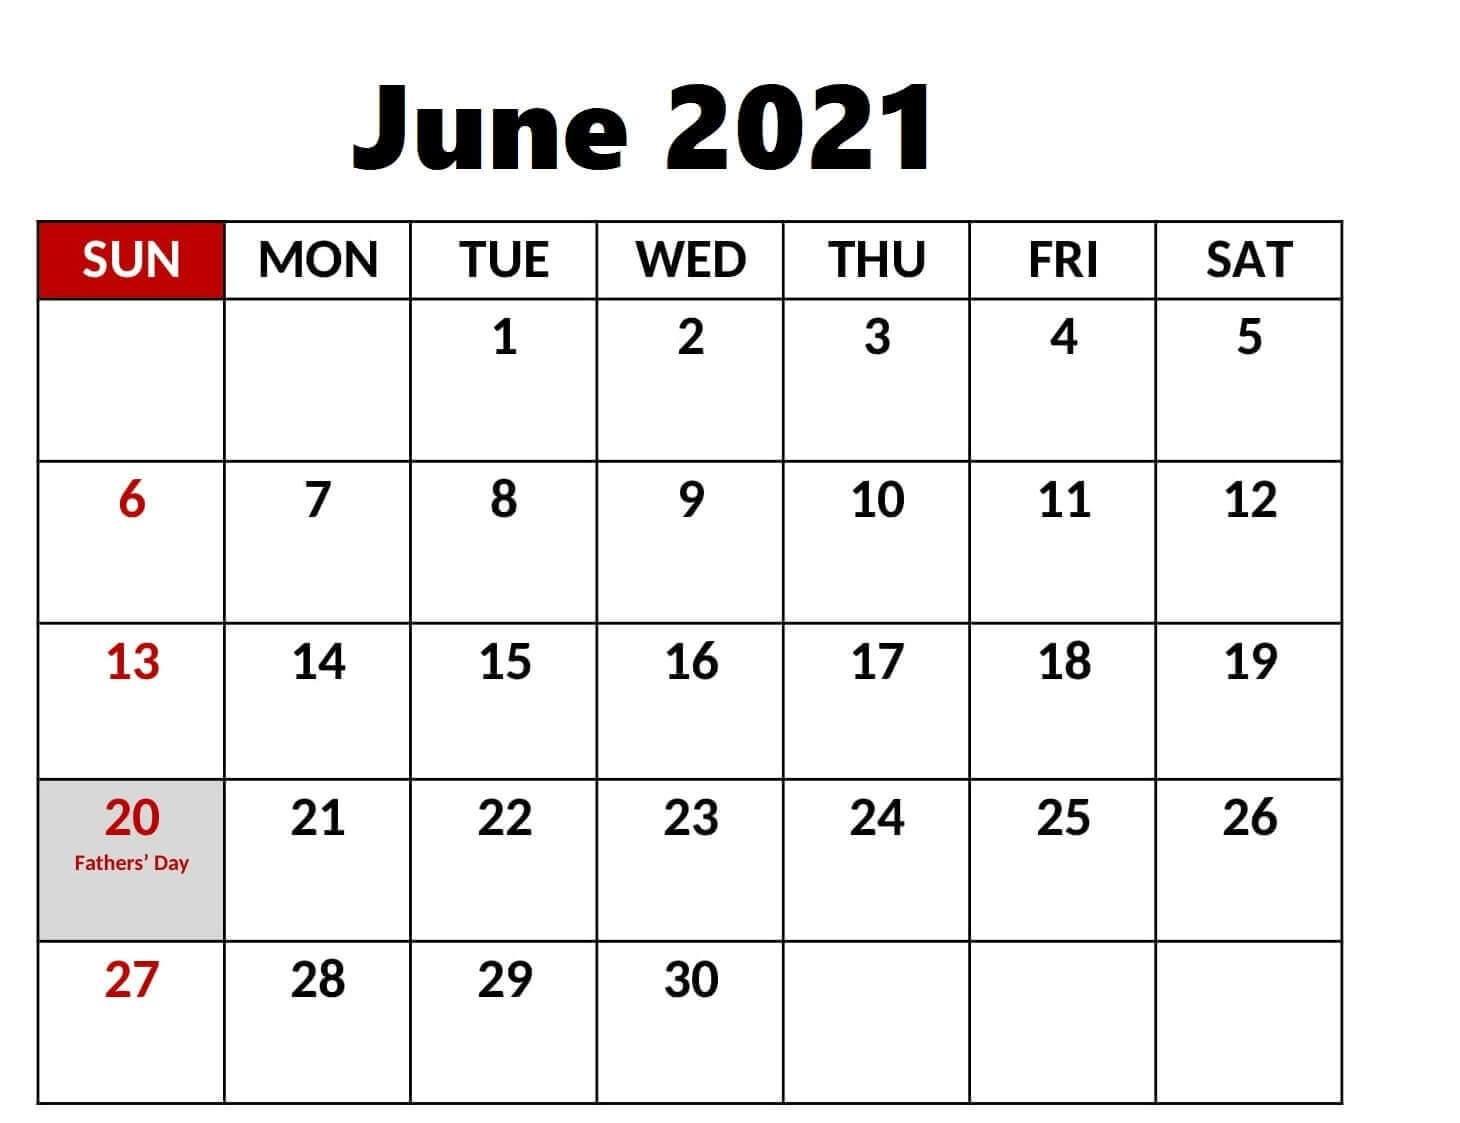 Printable June 2021 Calendar with Holidays